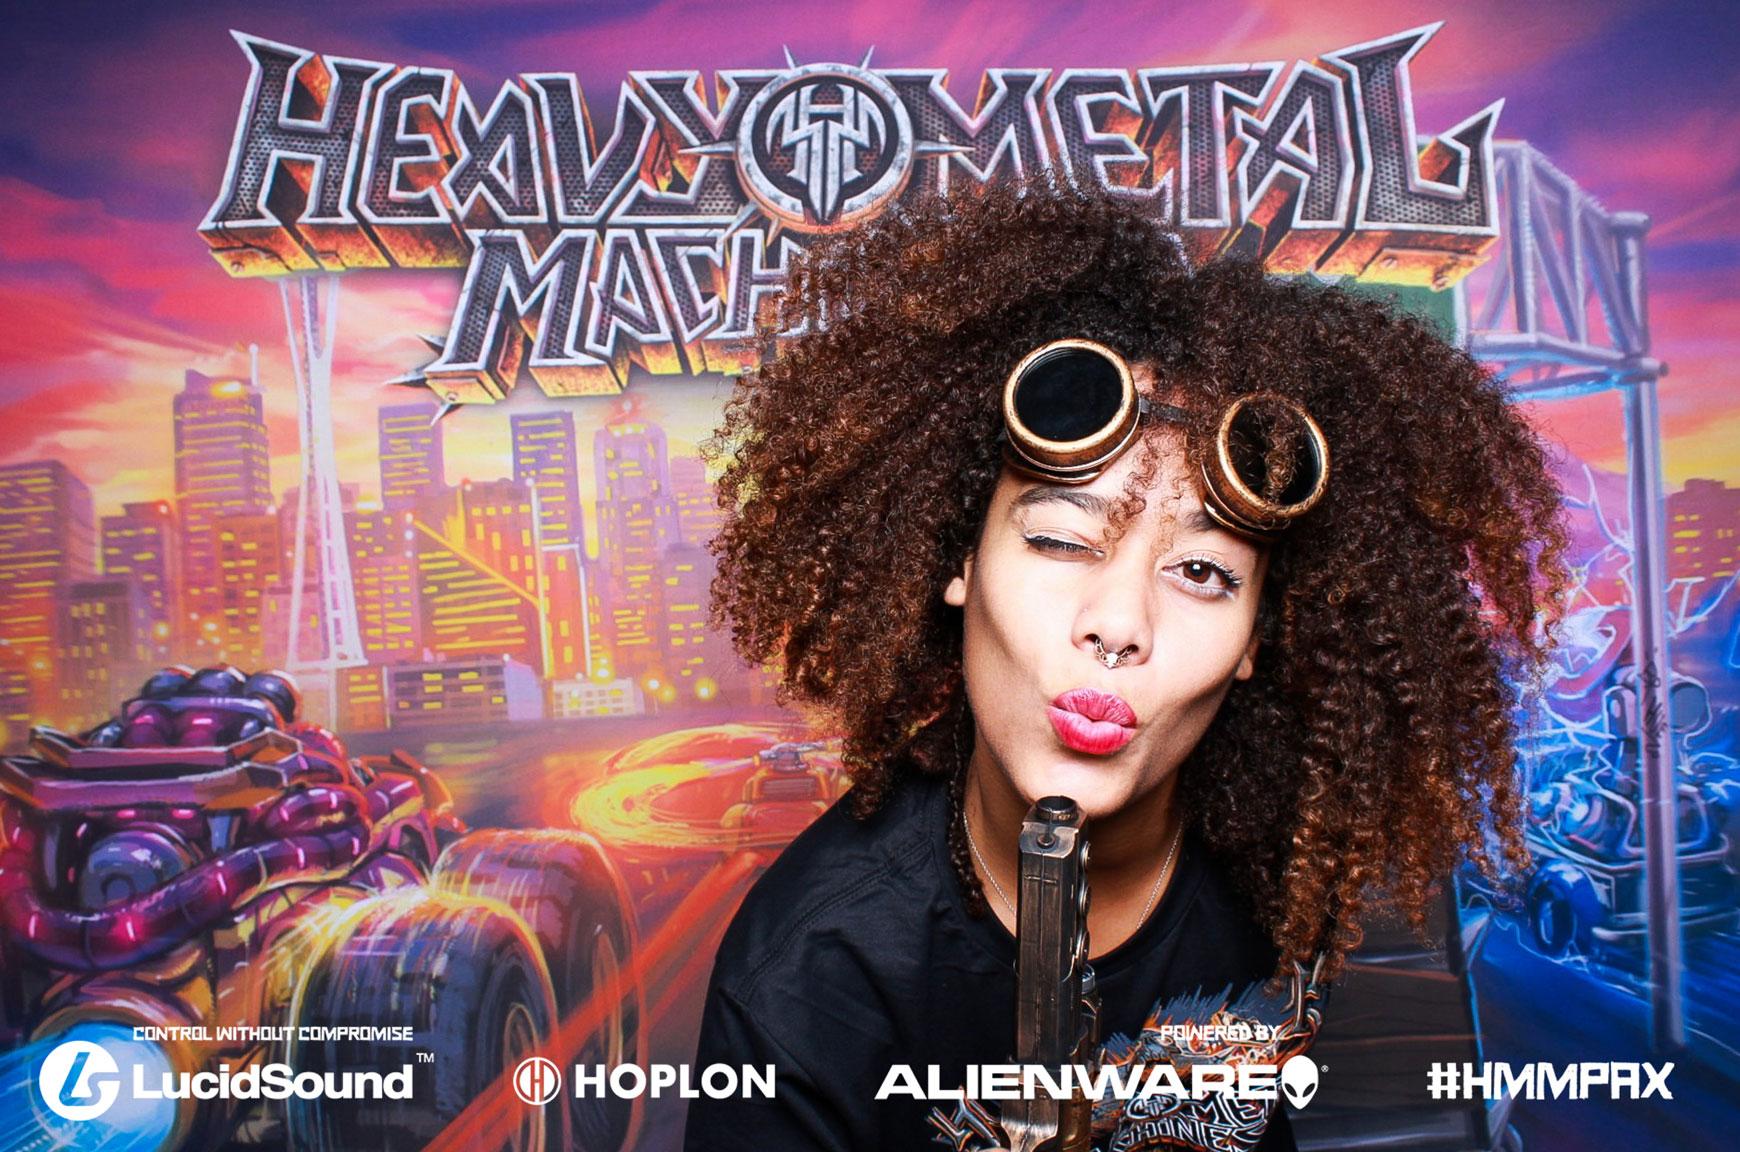 Heavy Metal machine photo booth